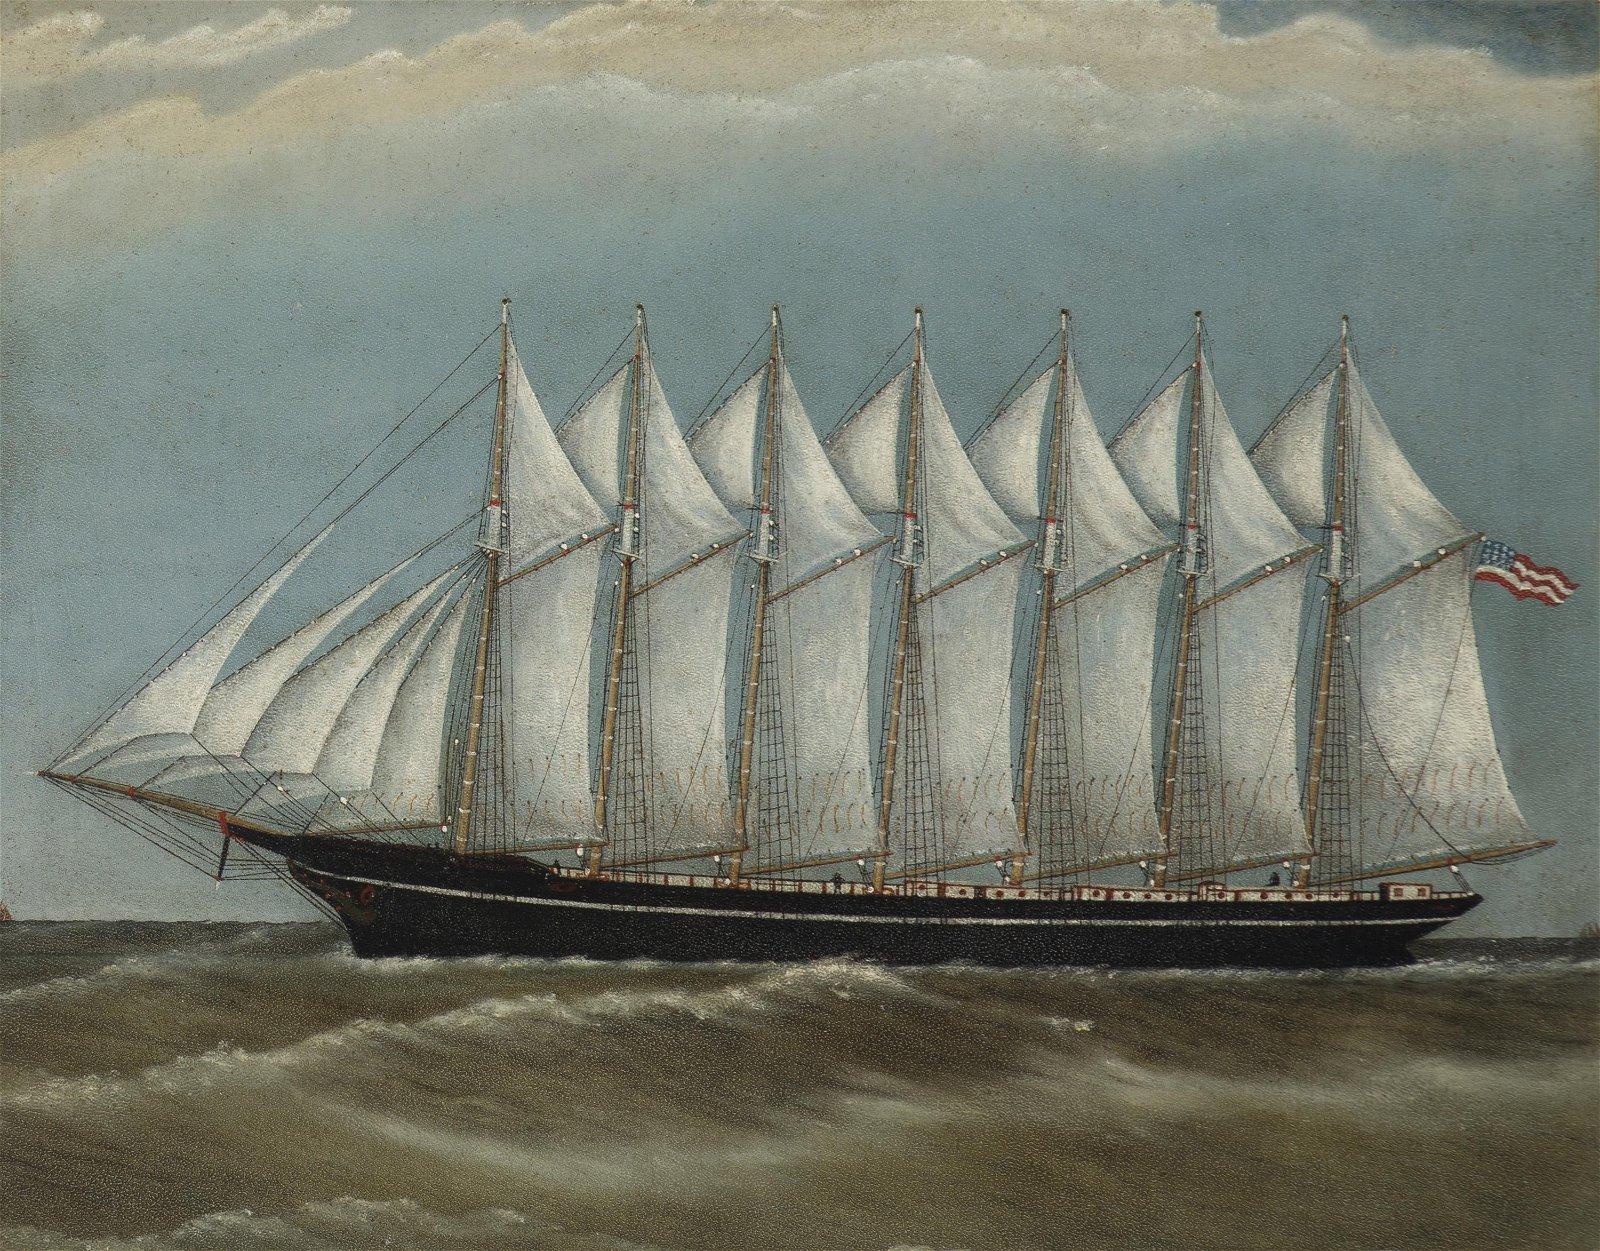 The Thomas W. Lawson, Seven-masted schooner